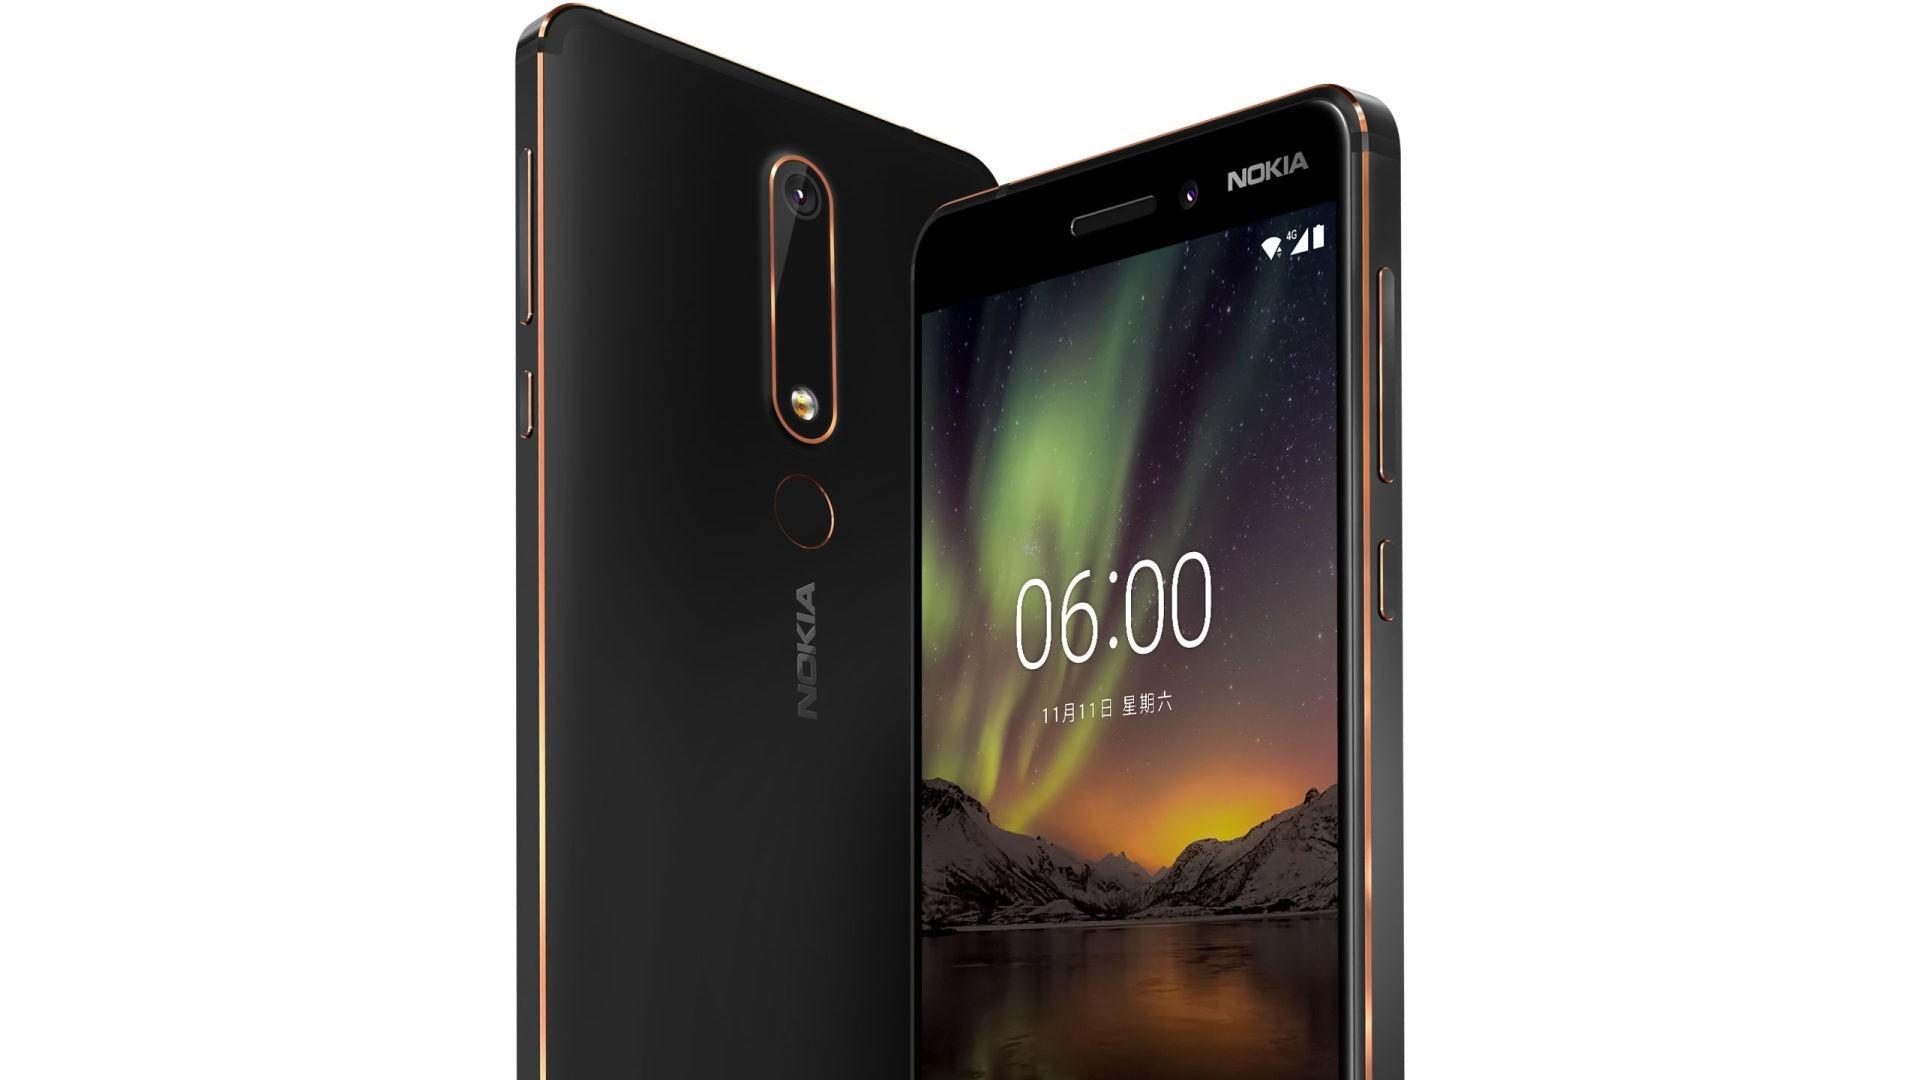 Nokia 6 2018 si aggiorna subito ad Android 8.0 Oreo